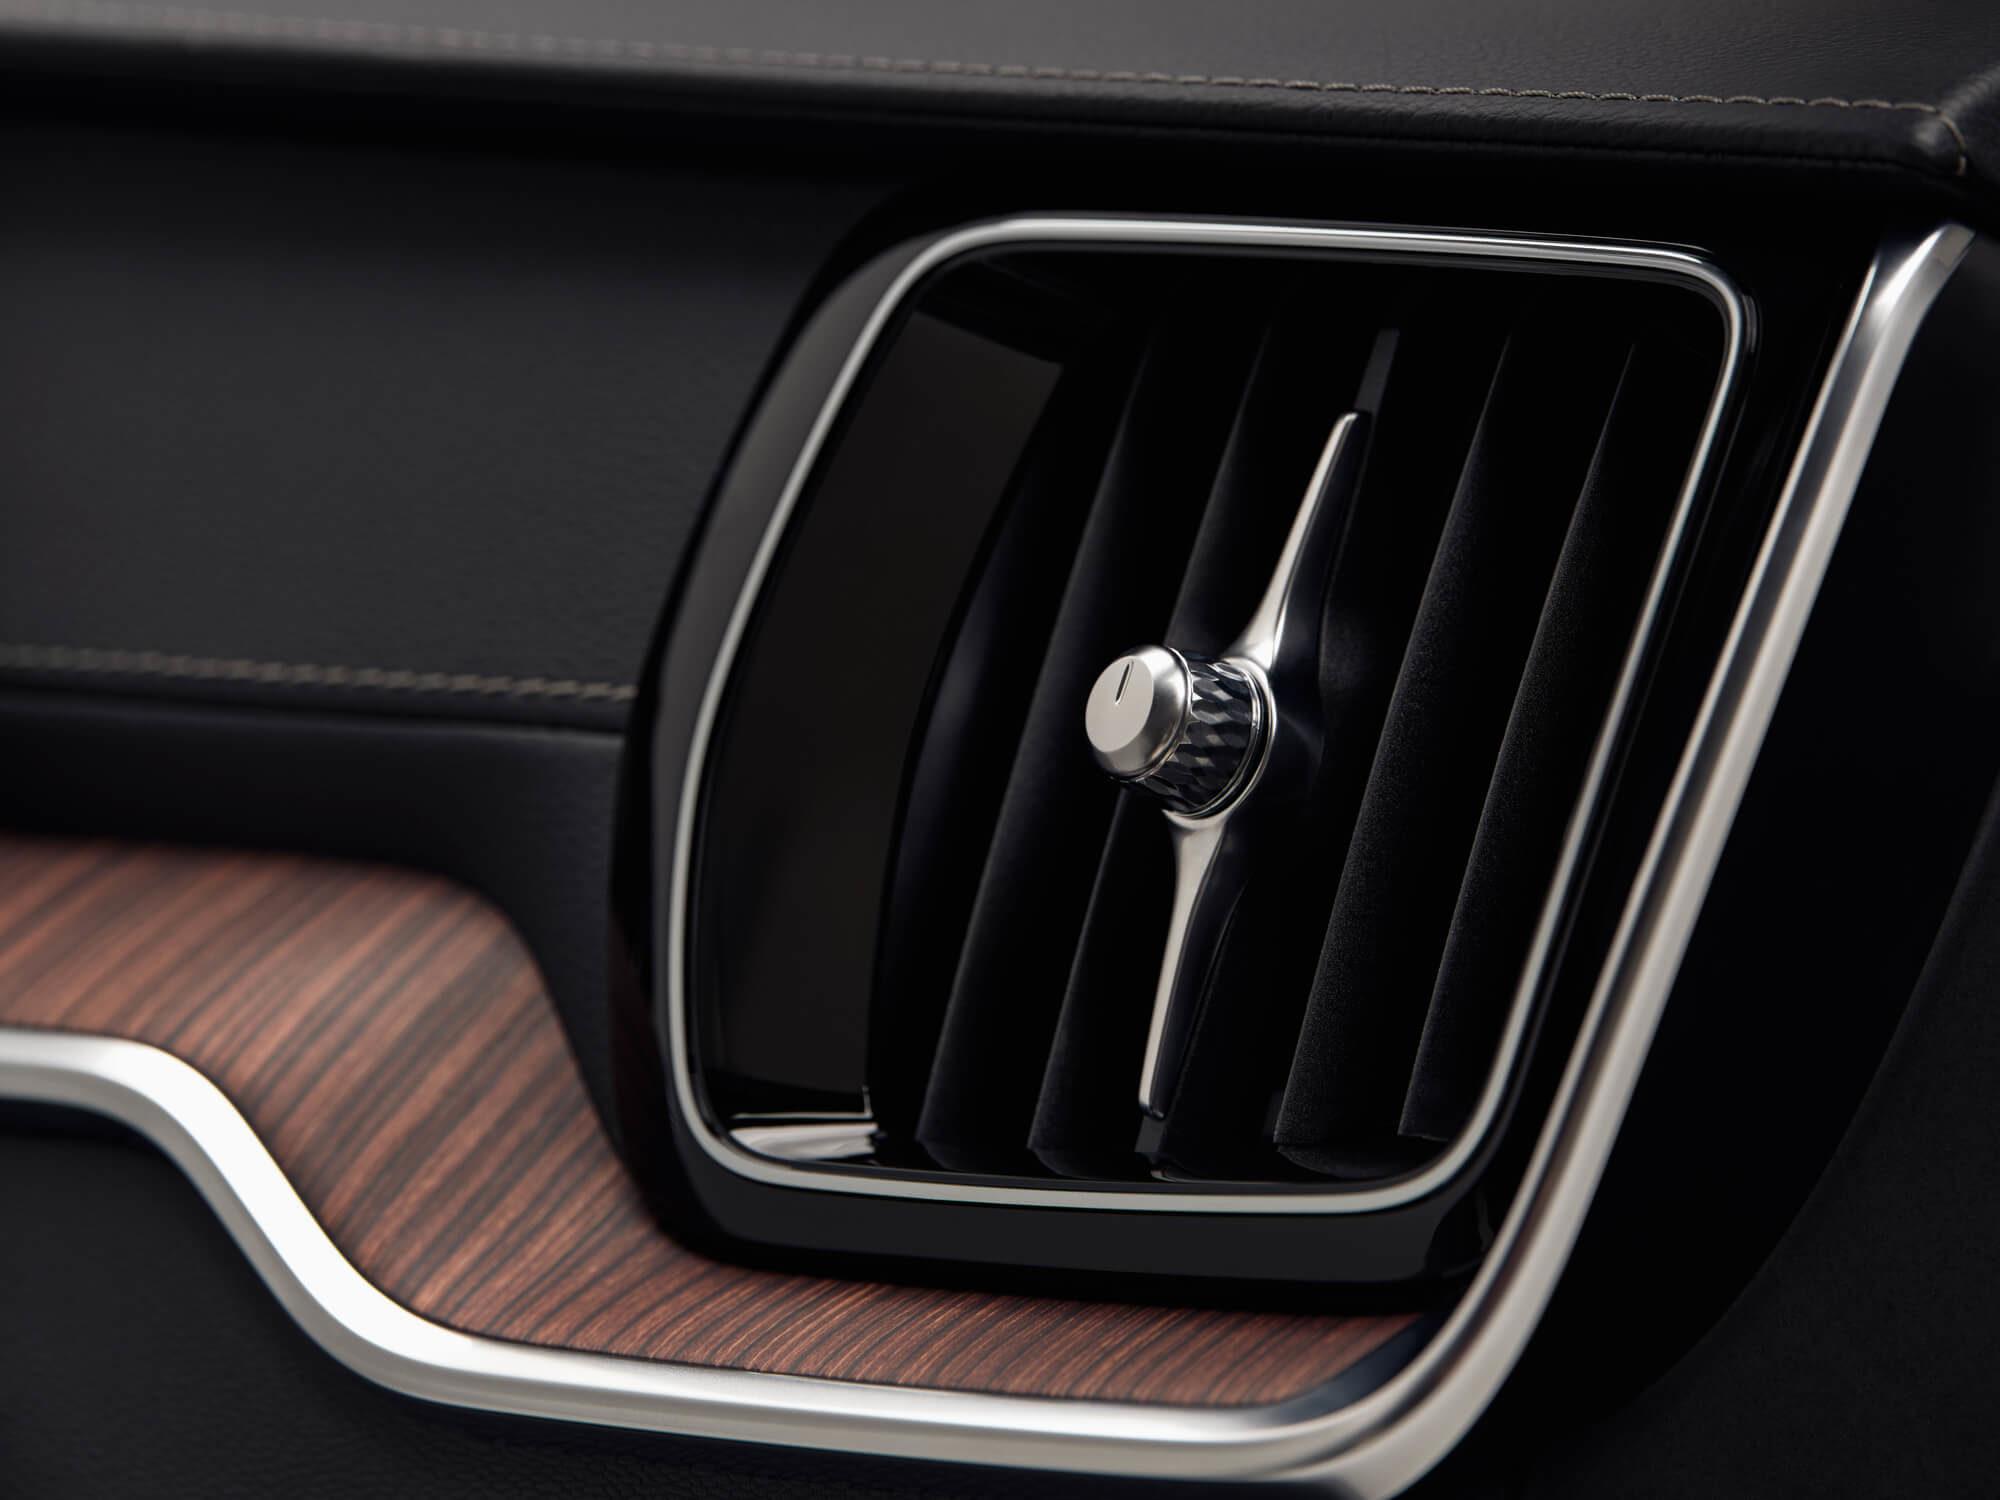 Volvo V60 ventilatie rooster detail